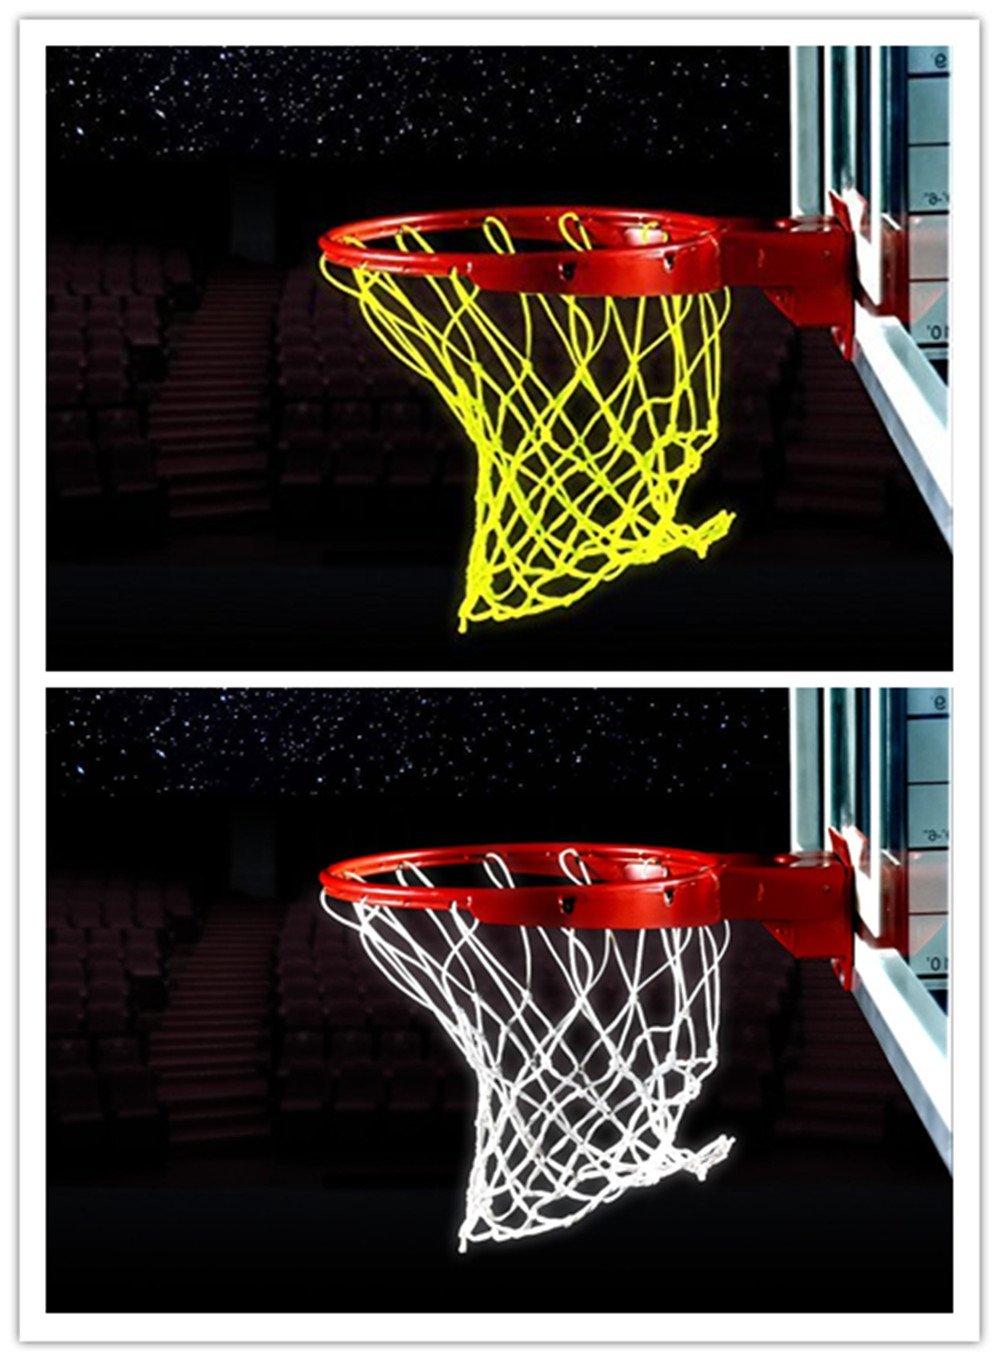 Bomach 2/St/ück Basketball Net Glow in The Dark Basketballkorb Net Professional Heavy Duty Innen-Basketball Sports Luminous Rand Net Ersatz f/ür Allwetter Wei/ß und Gr/ün